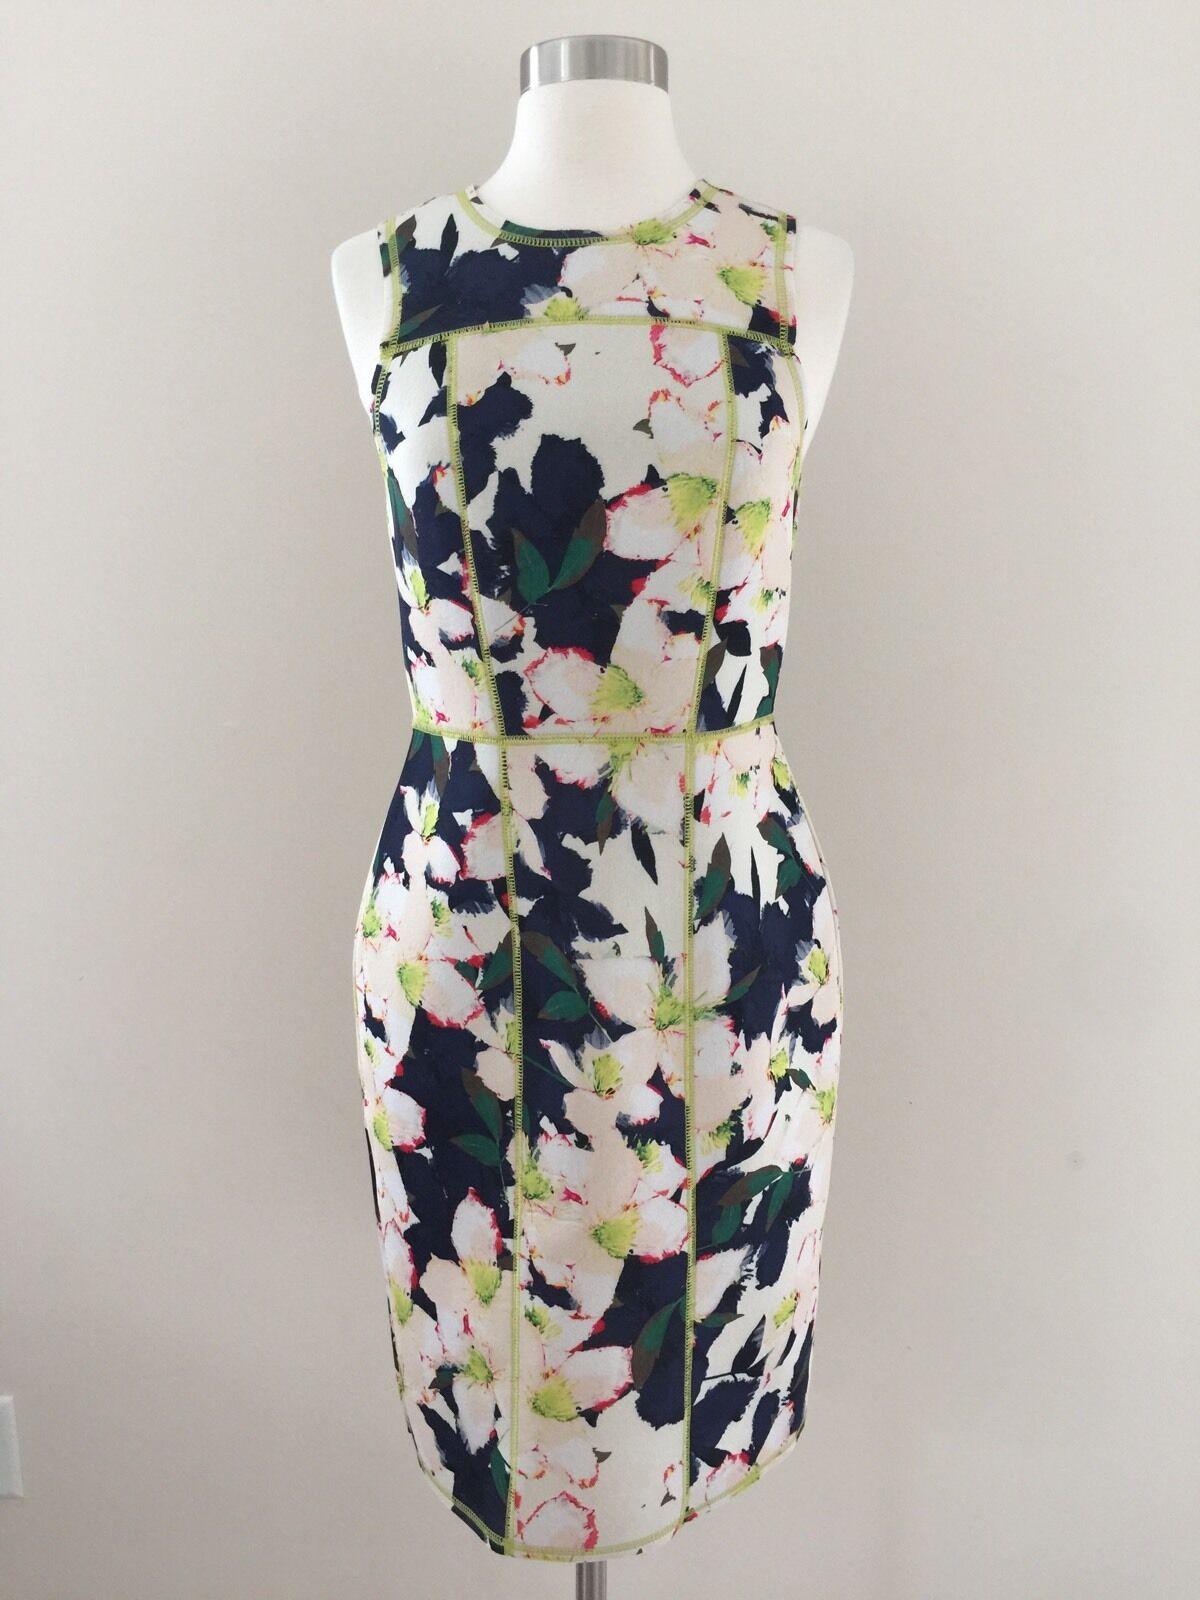 New Jcrew Weiß Grün Blau Floral Scuba Fitted Zipper Back Pencil Dress Größe 2